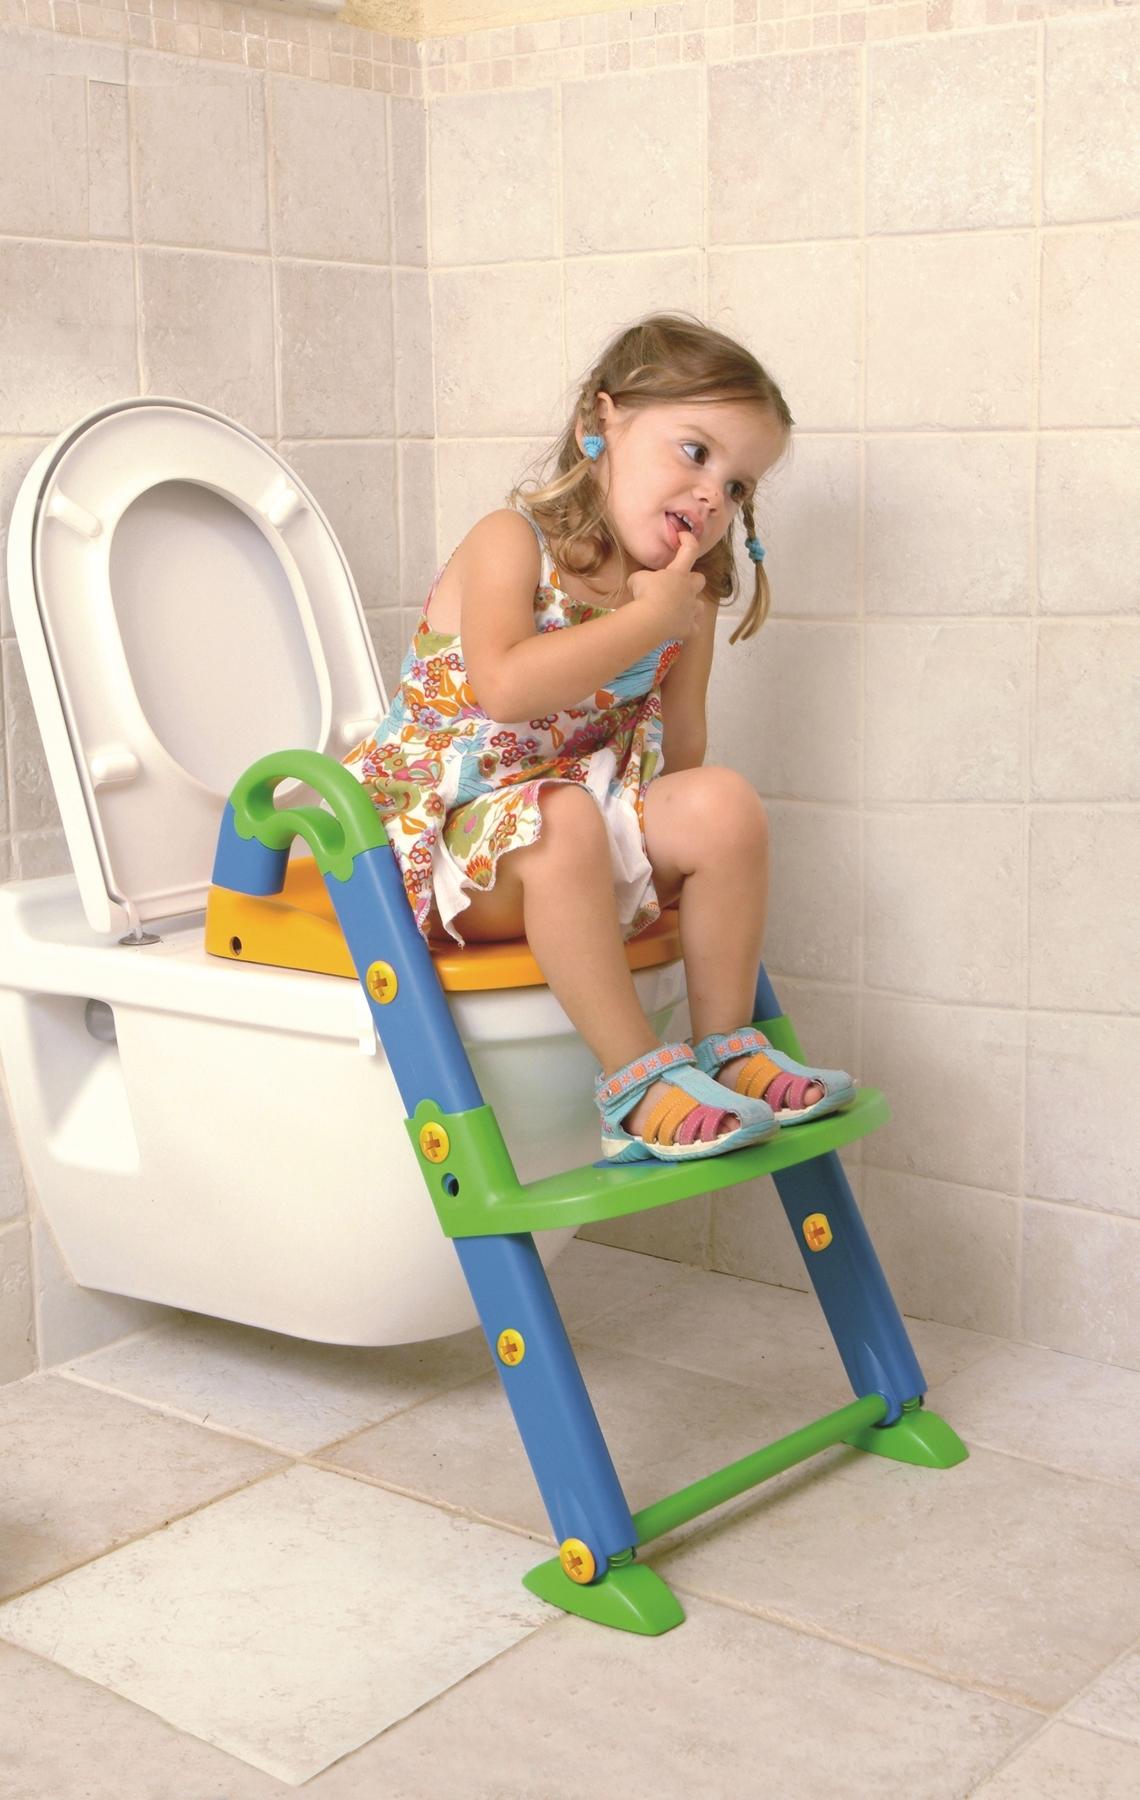 KidsSeat Toilette Trainer